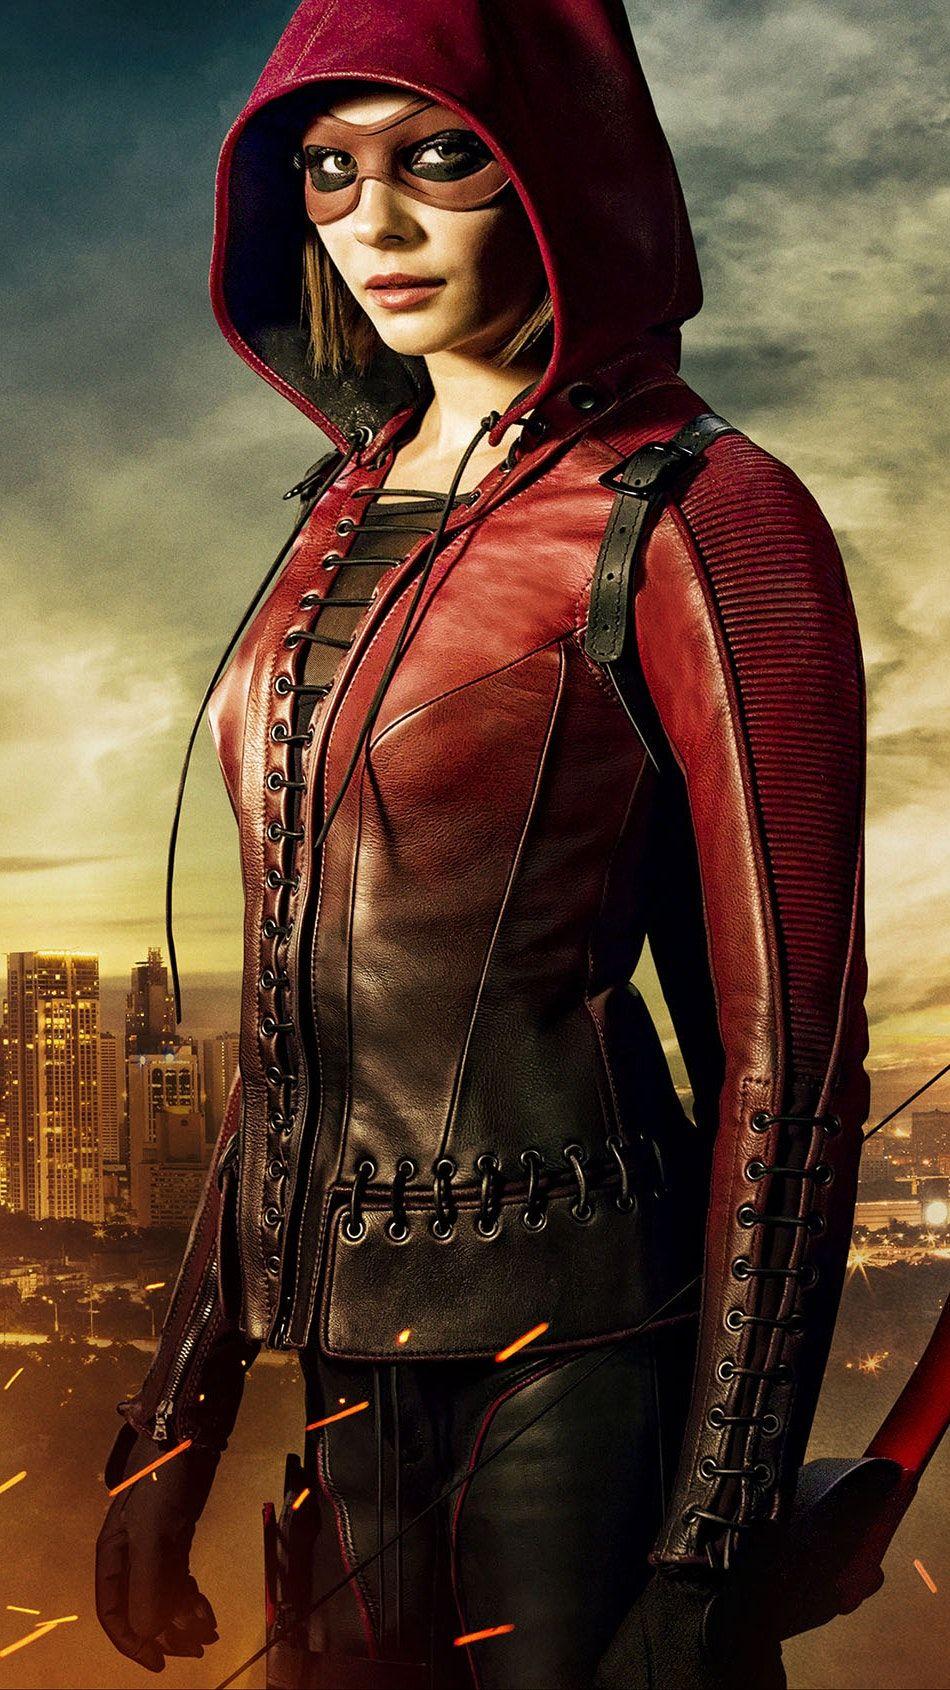 Arrow Phone Wallpaper Arrow tv series, Arrow season 4